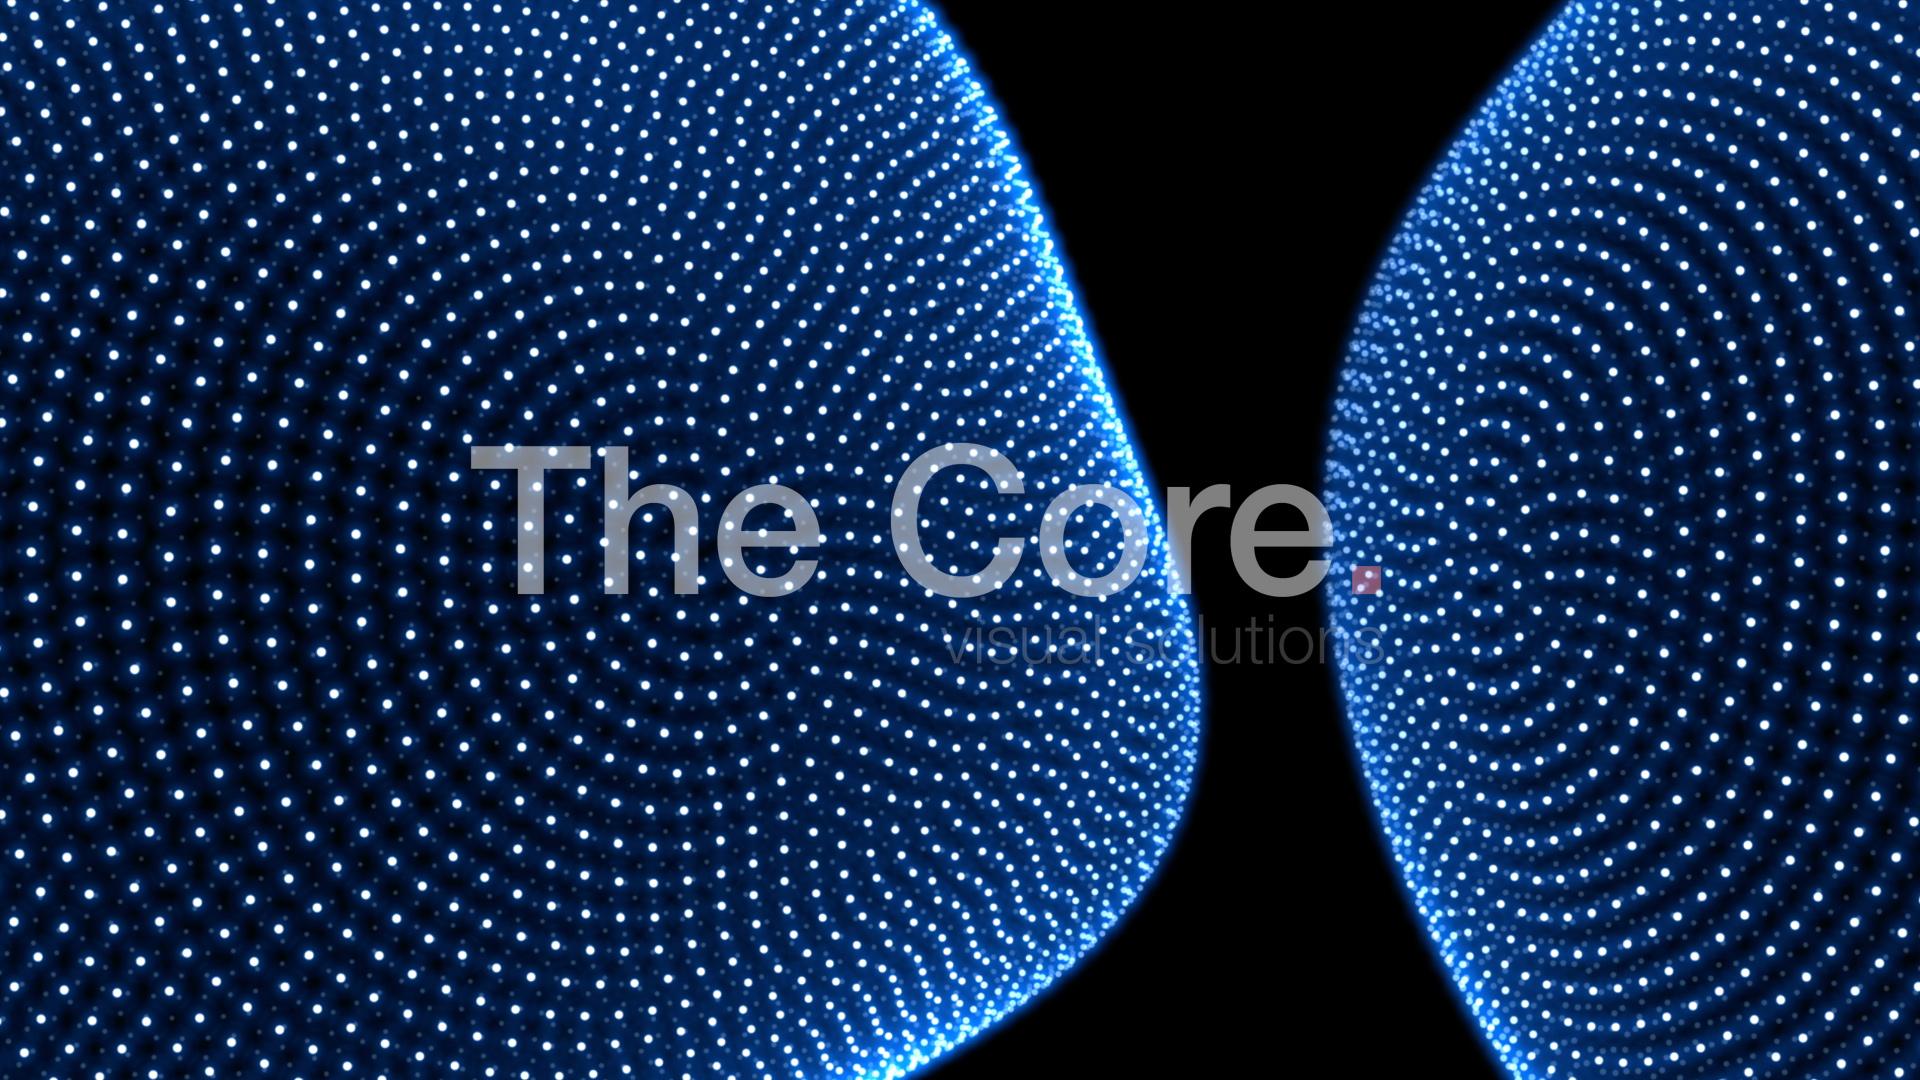 00088-WOBBLE-double-morph-2-STILL-by-The-Core